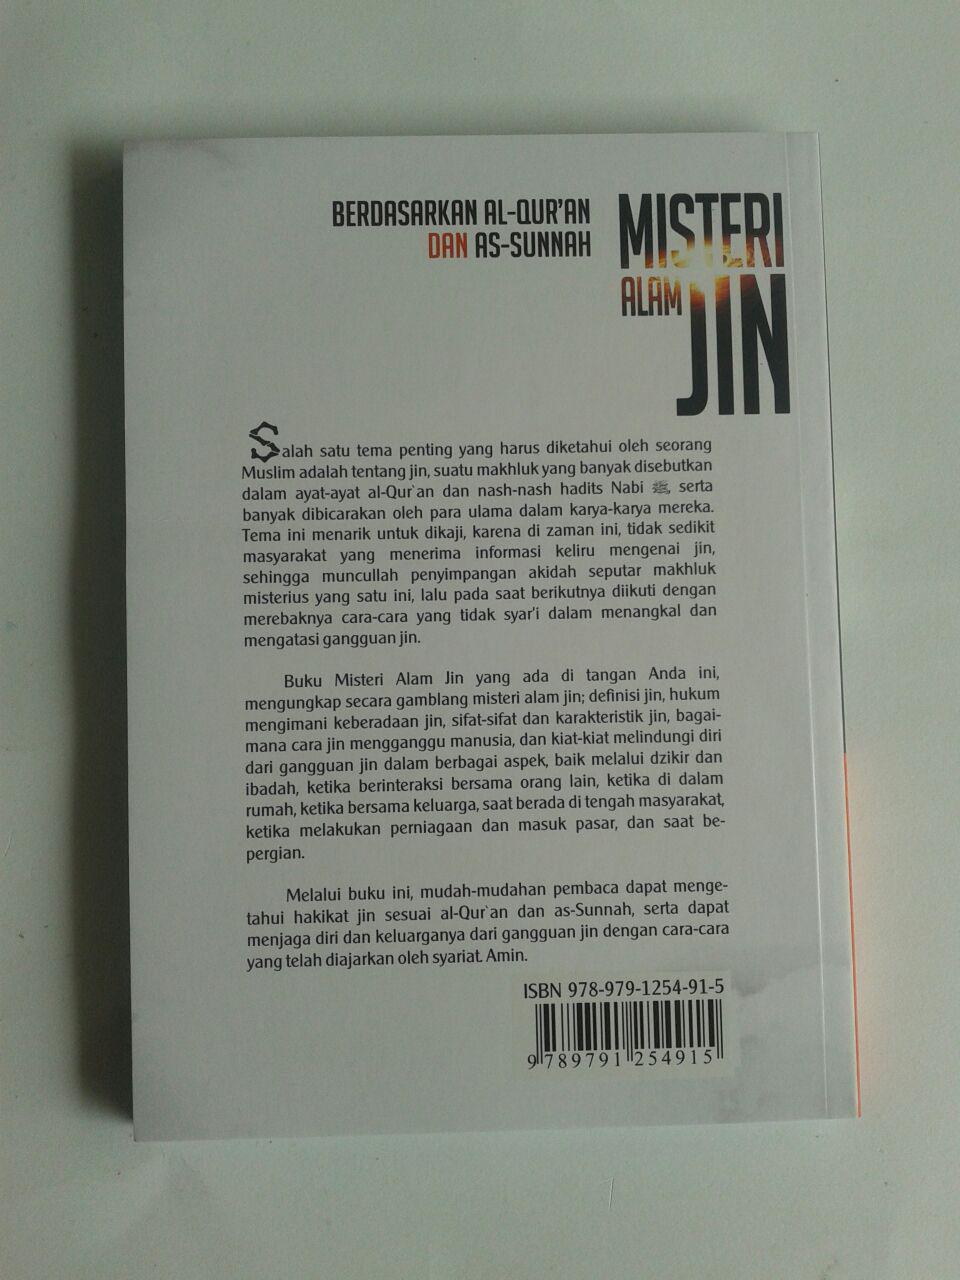 Buku Misteri Alam Jin Berdasarkan Al-Quran dan As-Sunnah cover